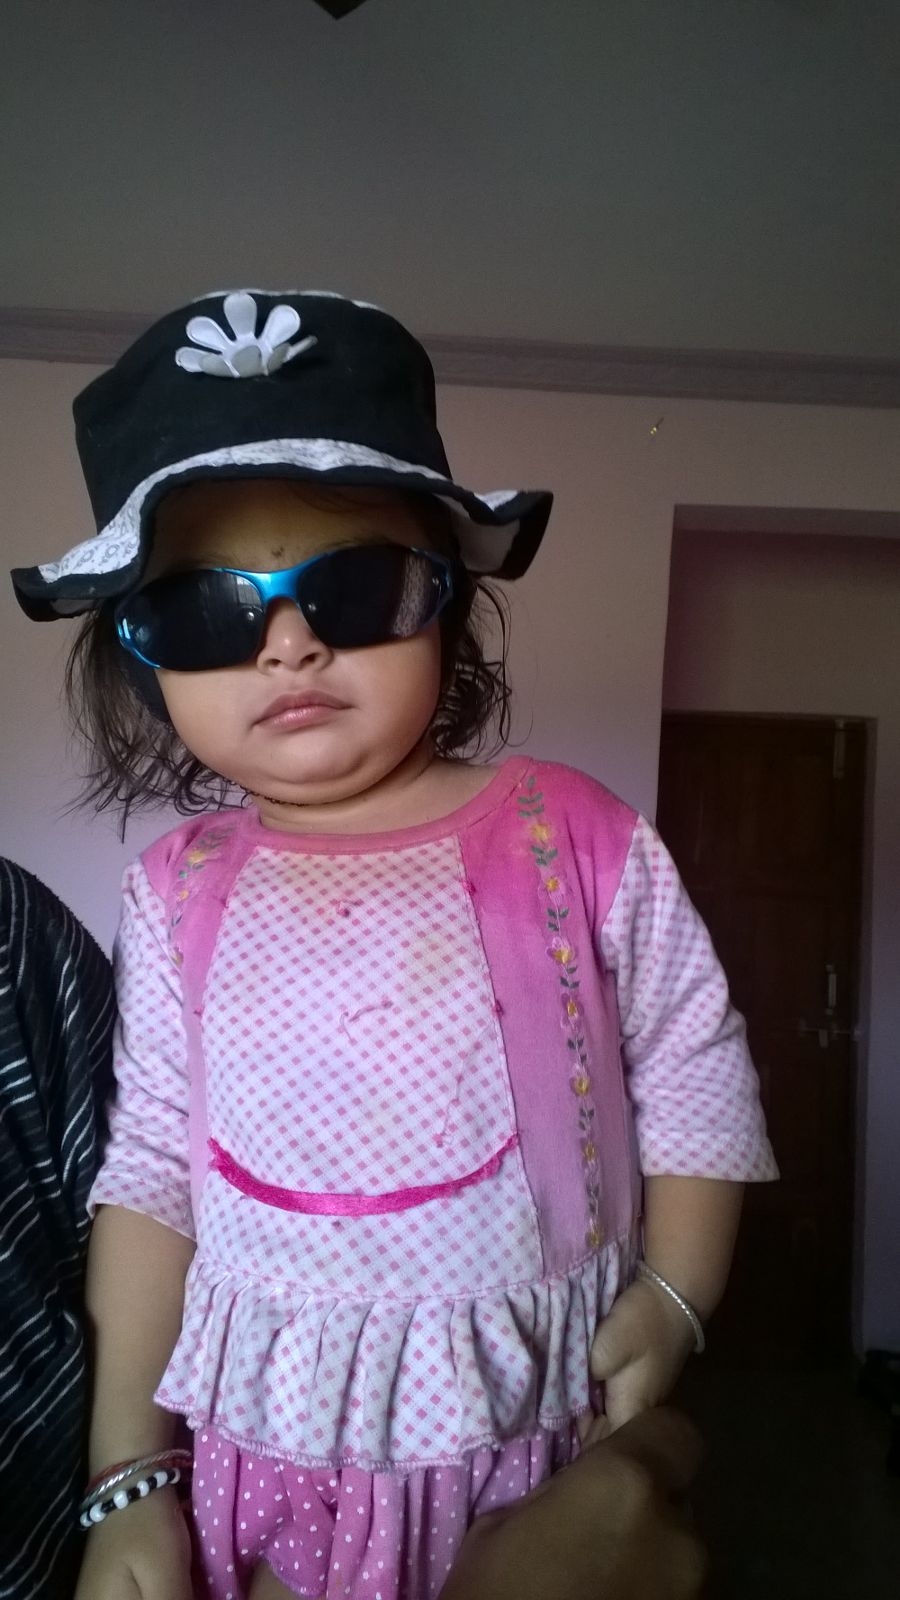 Radhika Jha